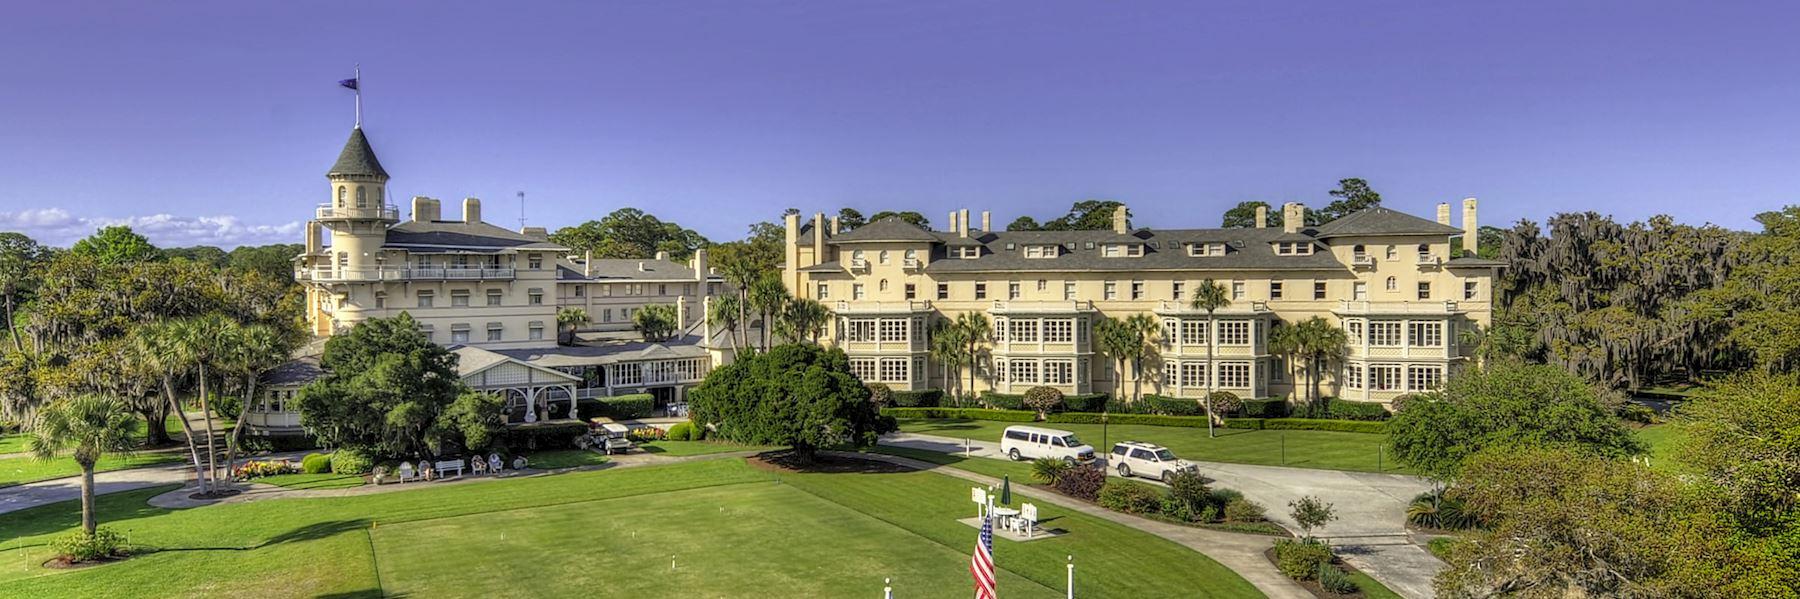 Jekyll Island Georgia Club Hotel